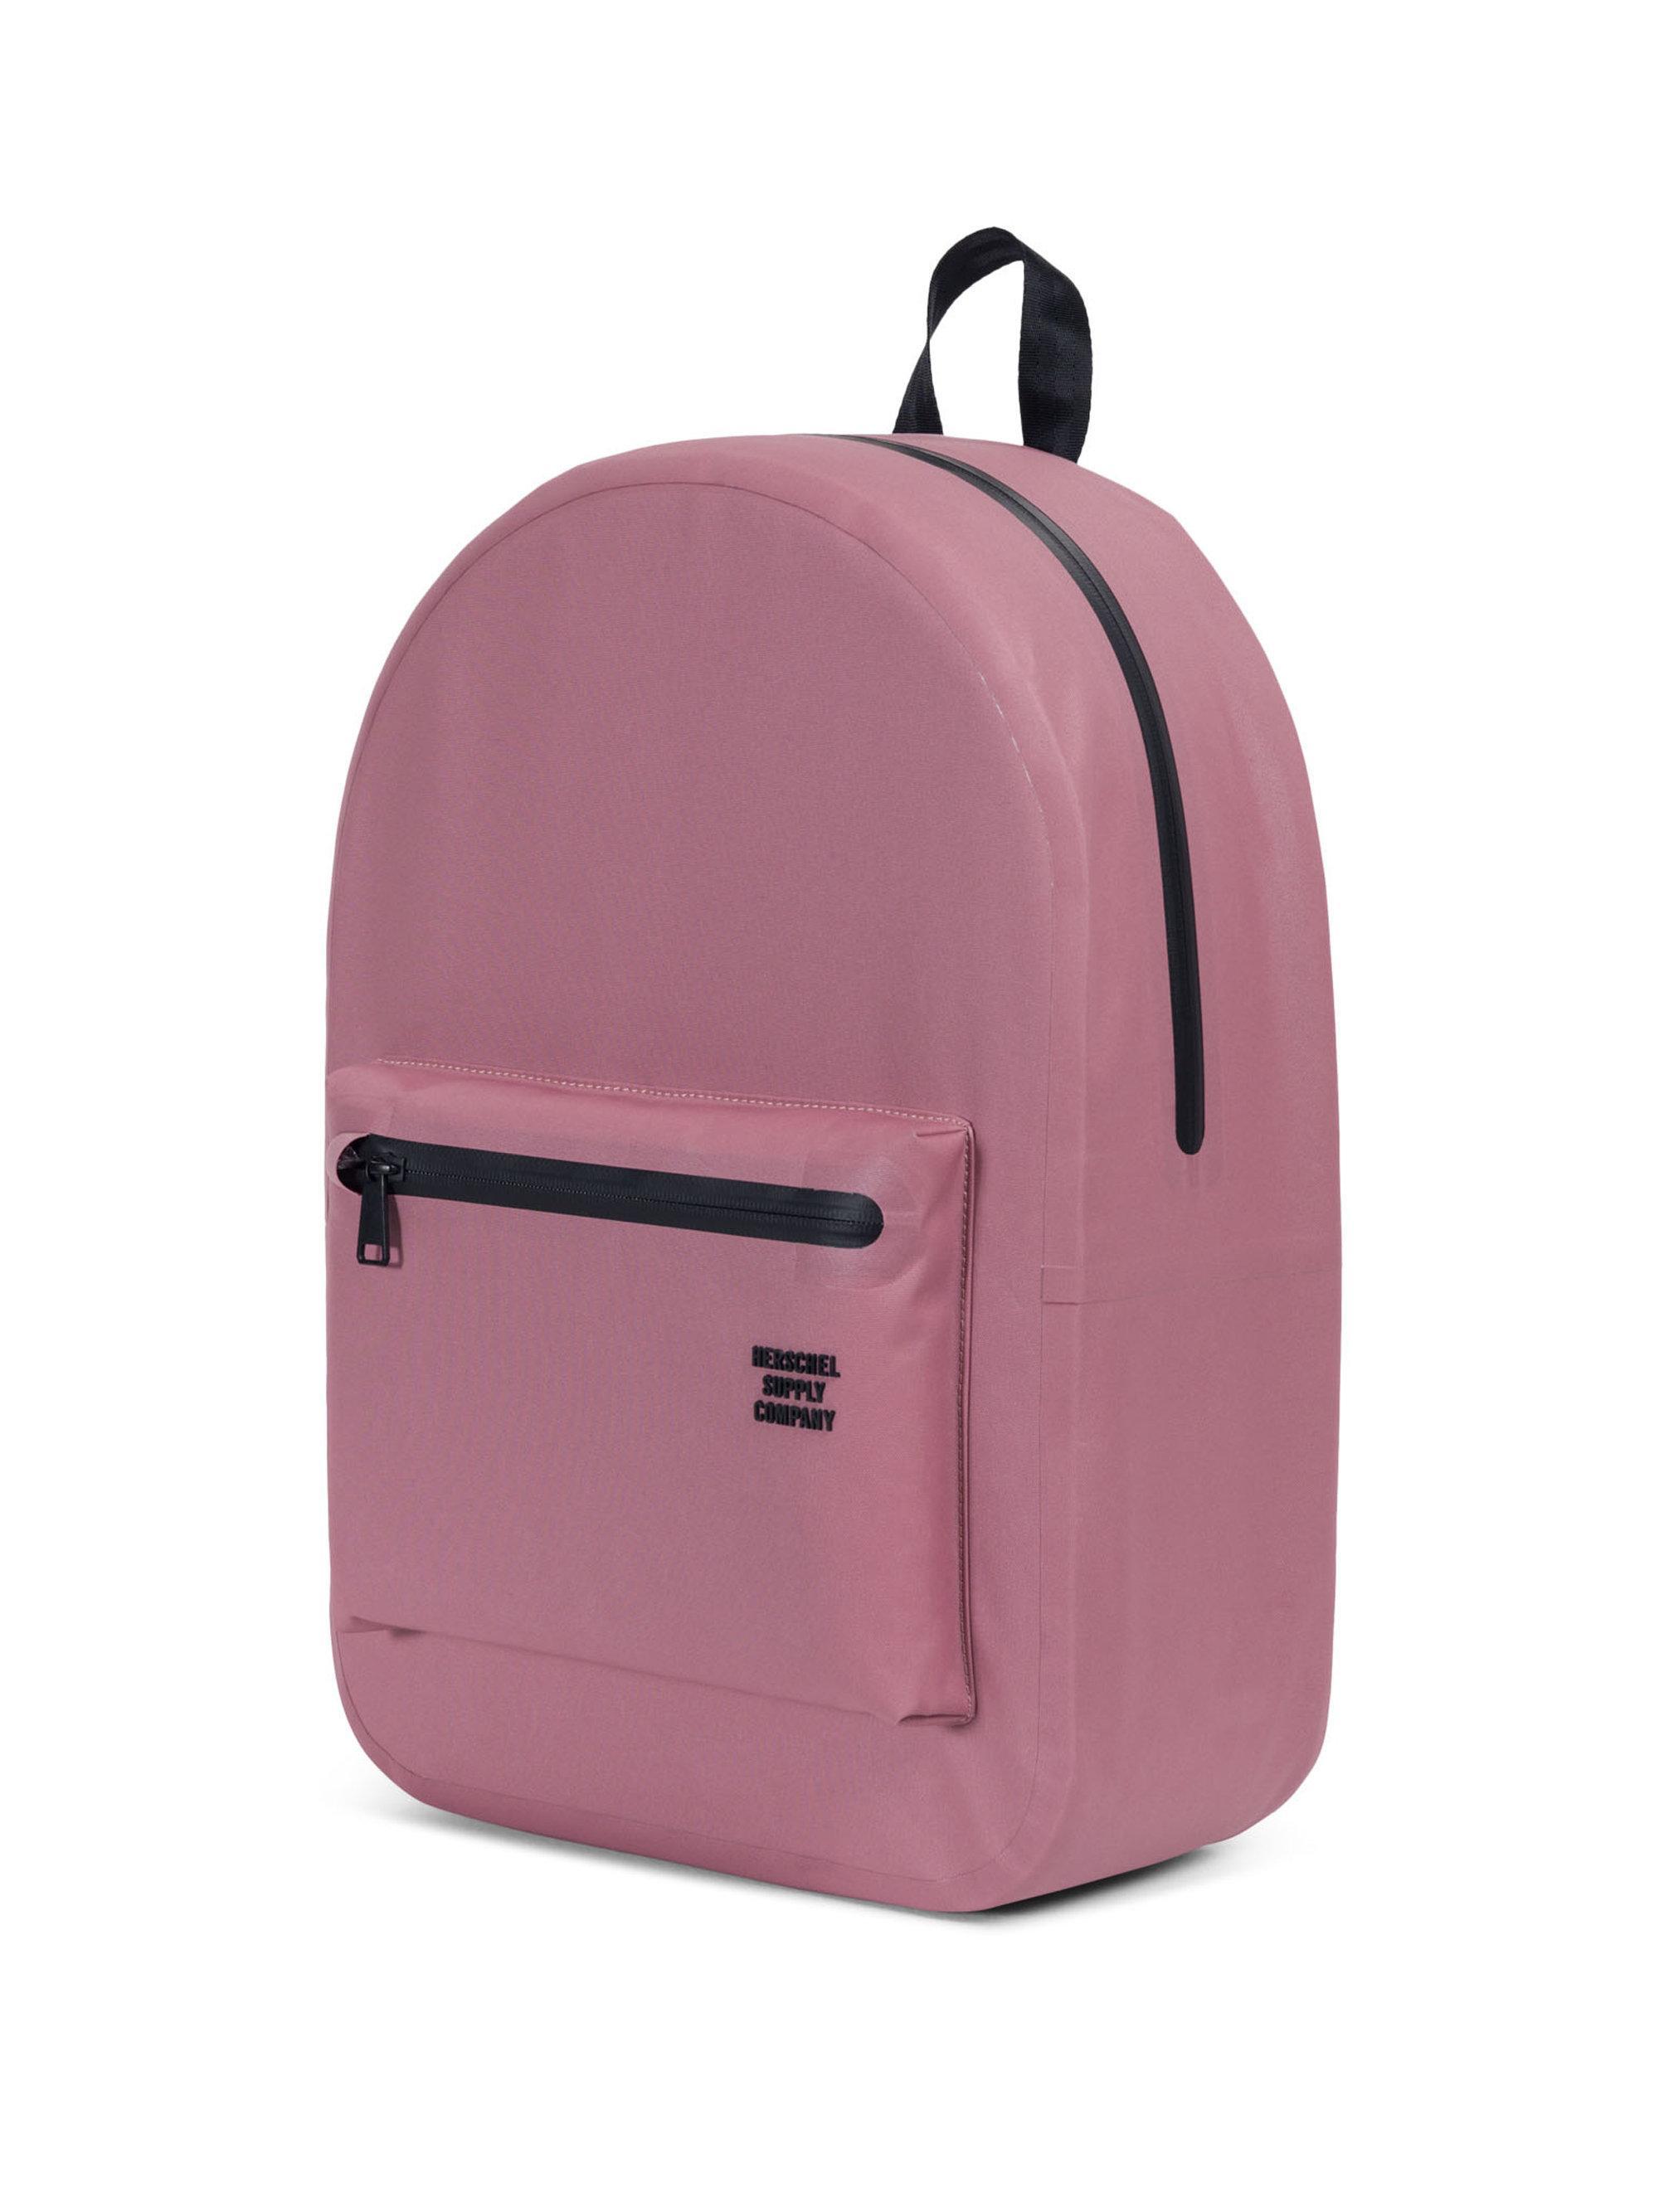 bf0ba6beda9 Herschel Supply Co. Men s Settlement Tarpaulin Backpack - Ash Rose in Pink  for Men - Save 59% - Lyst